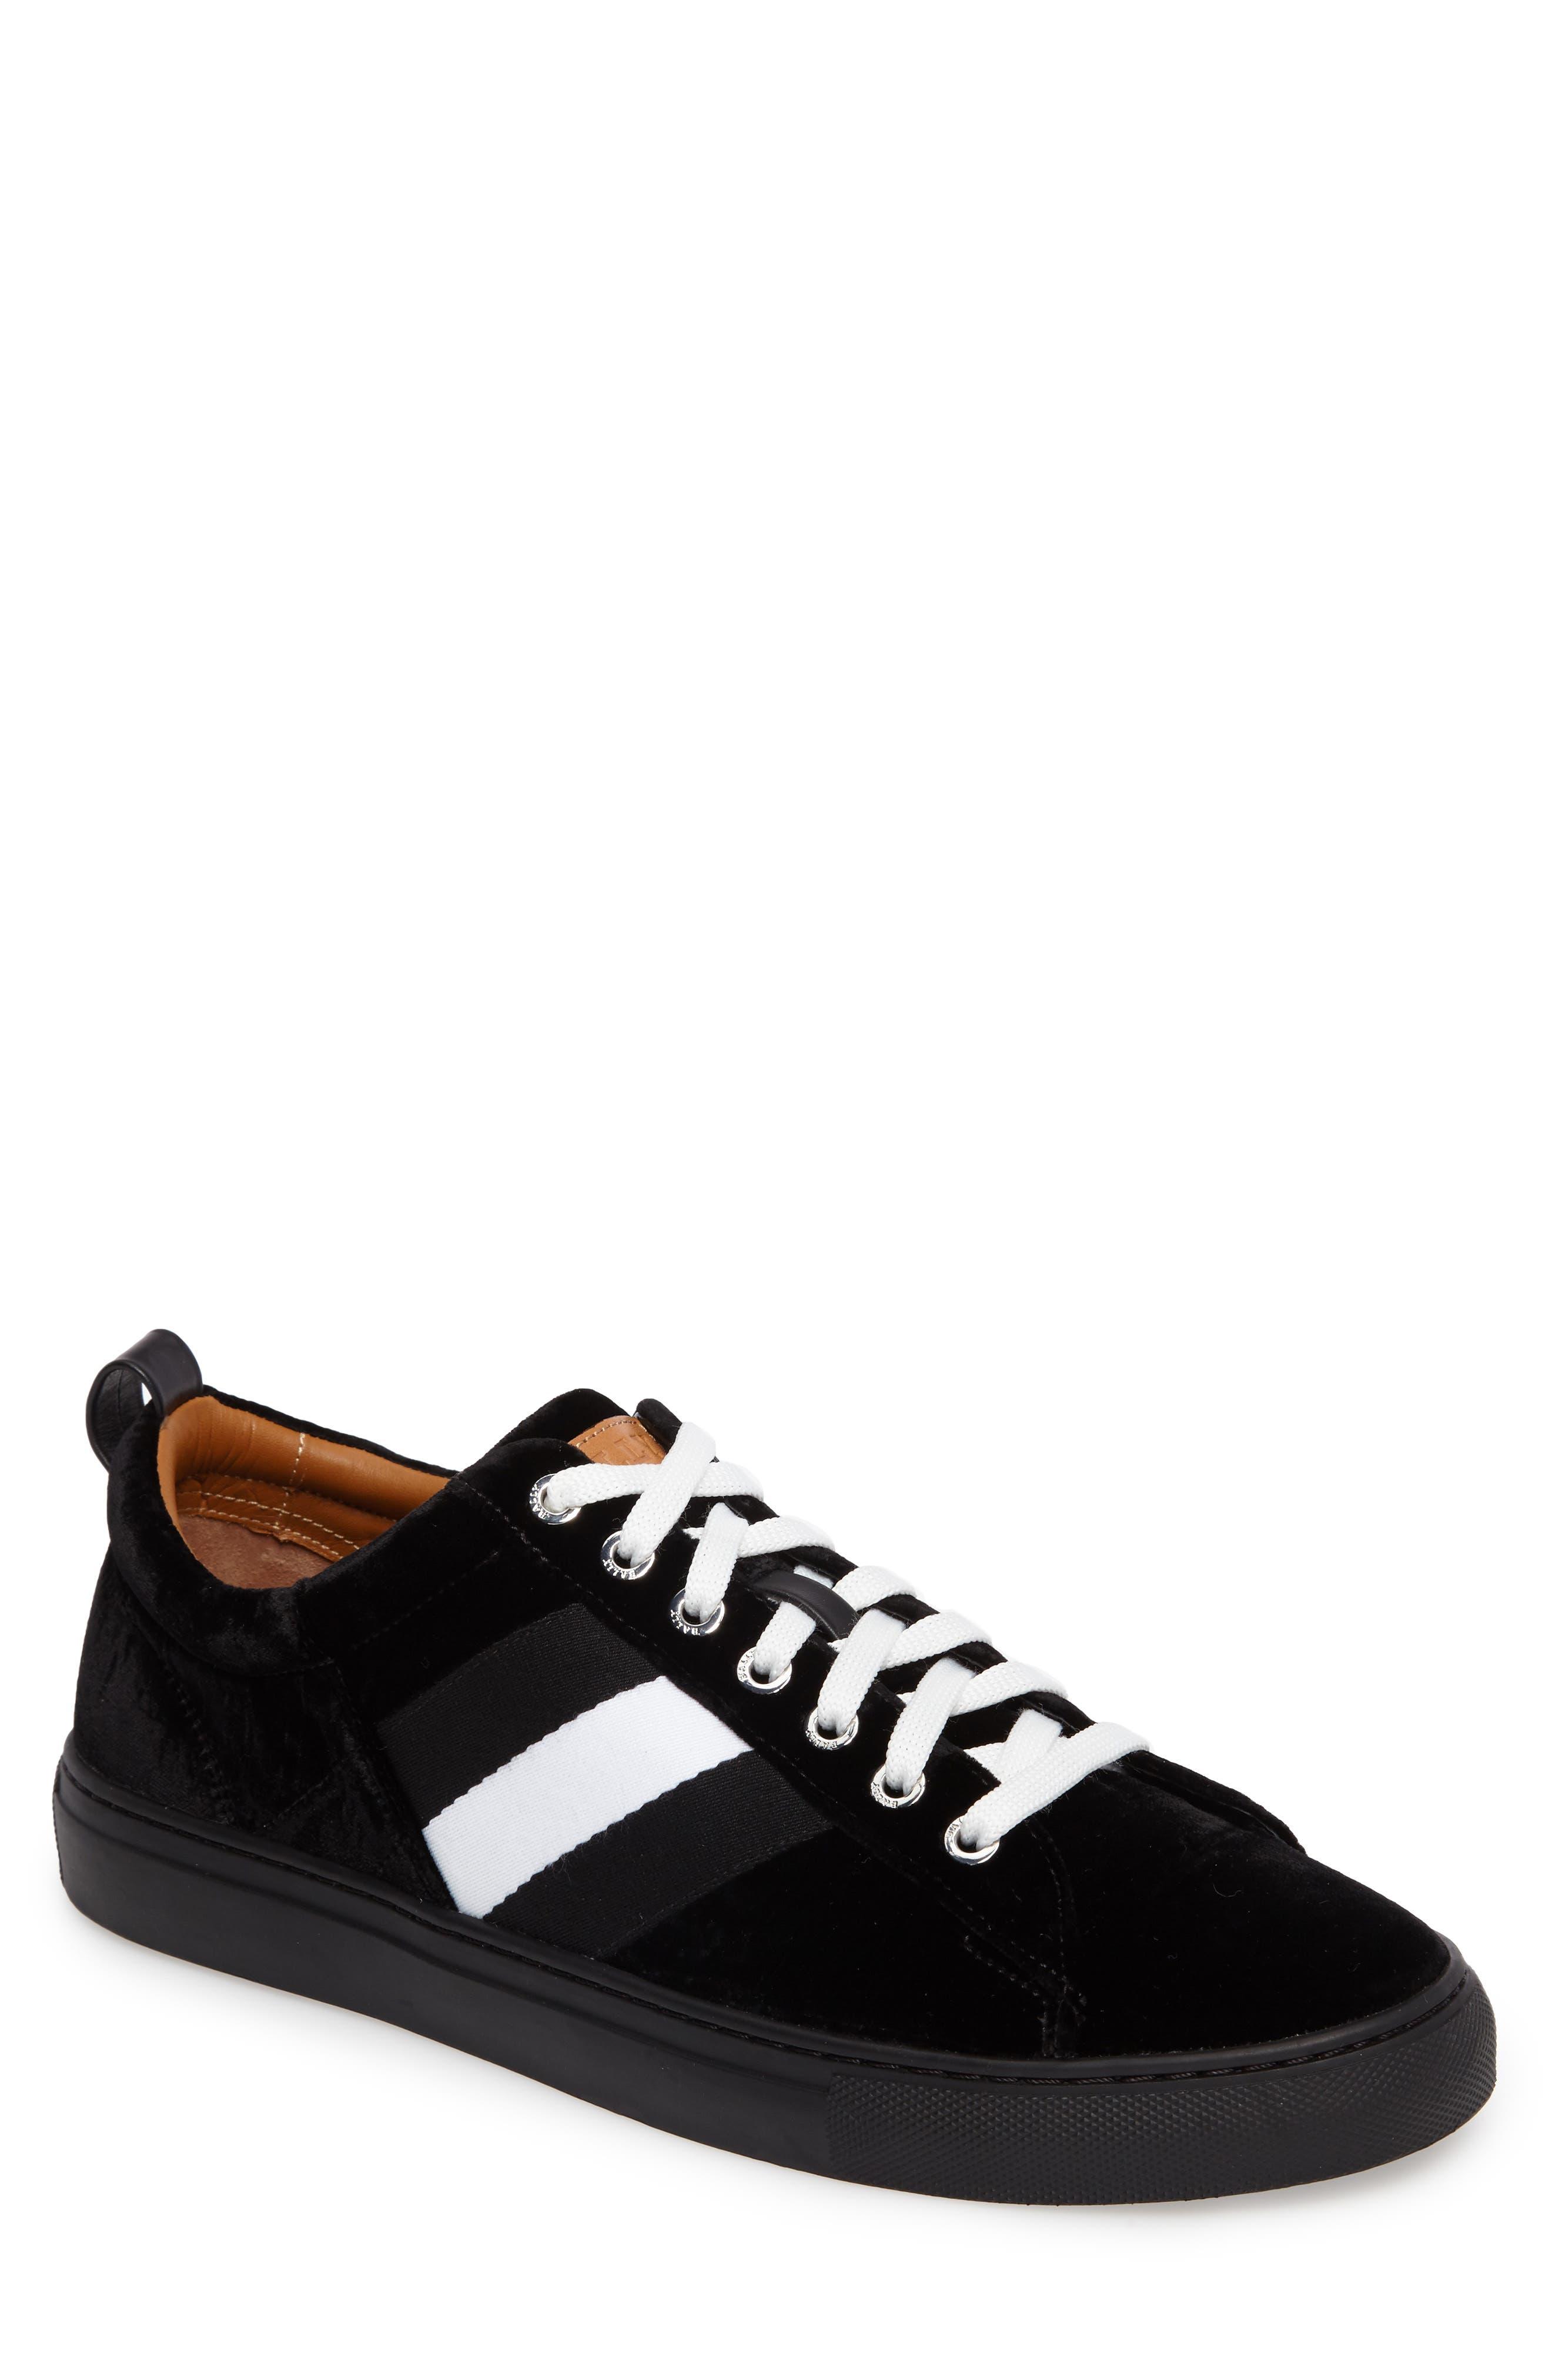 'Helvio' Sneaker,                             Main thumbnail 3, color,